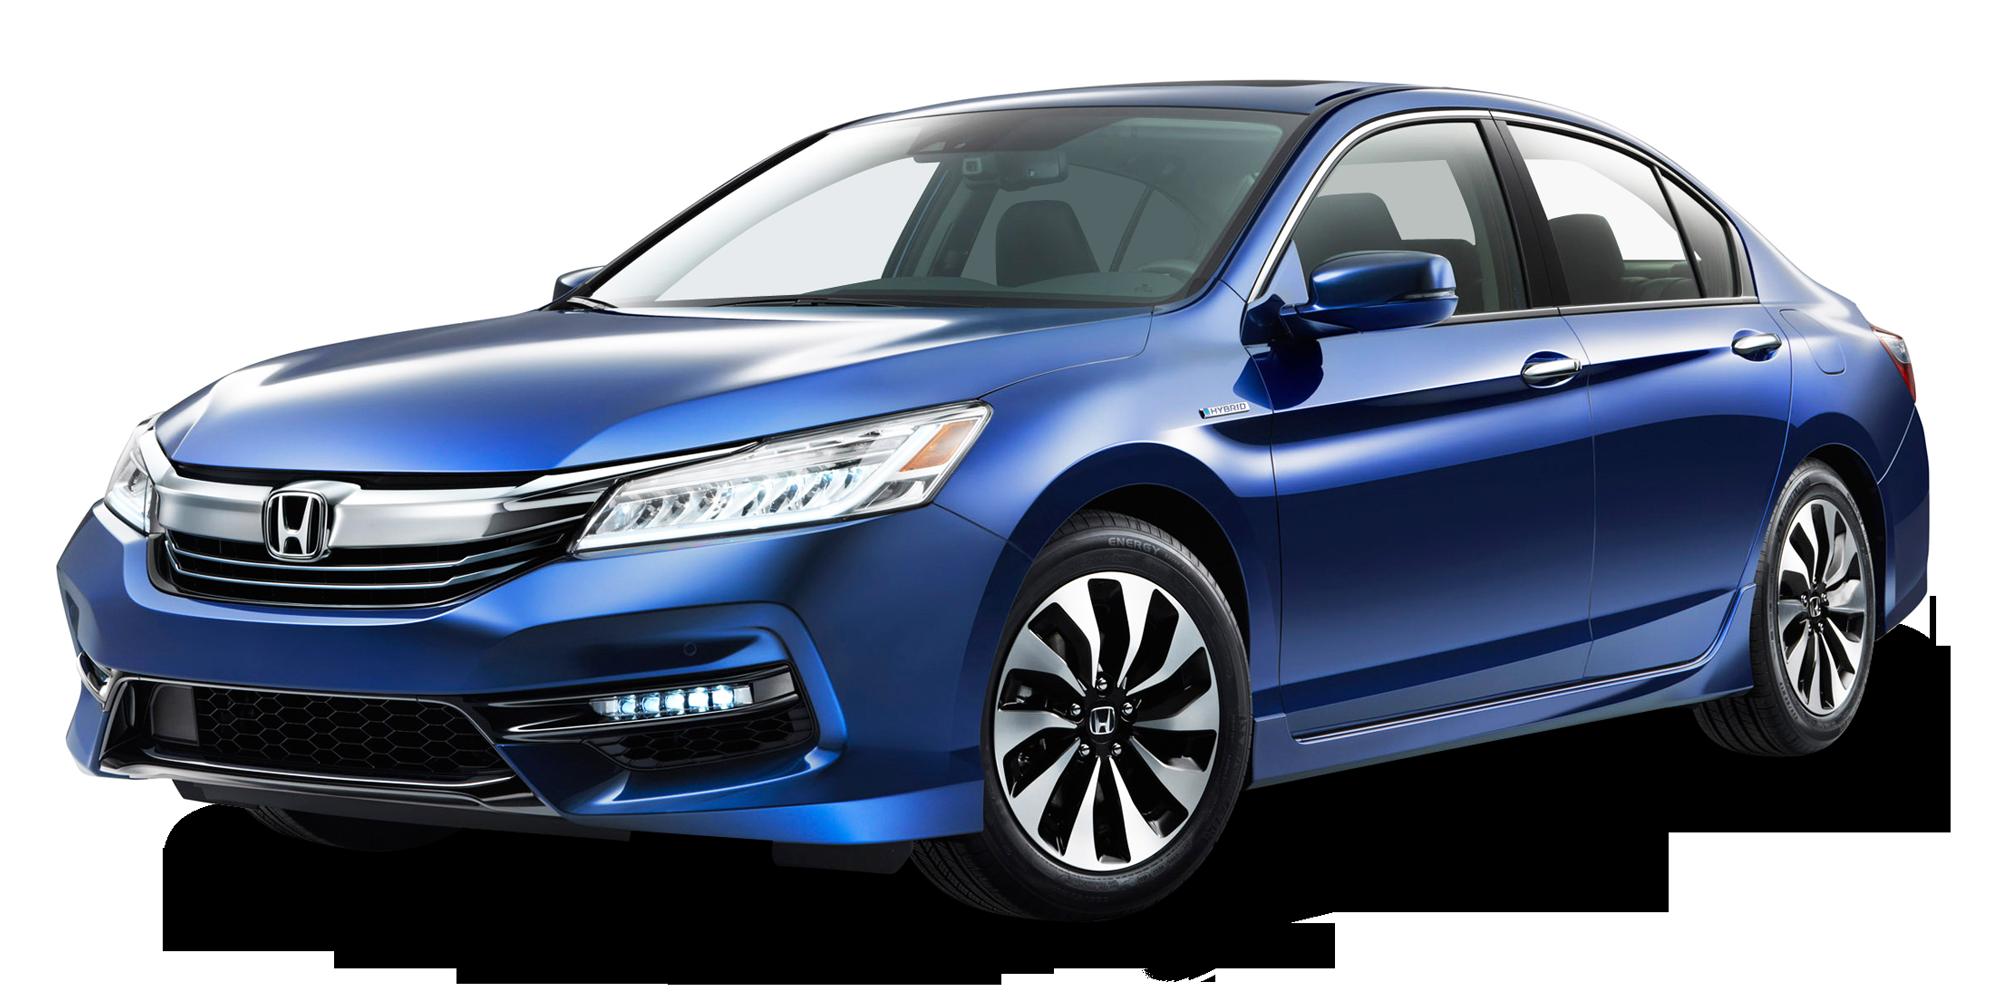 Hybrid car clipart clip royalty free download Blue Honda Accord Hybrid Car PNG Image - PurePNG | Free transparent ... clip royalty free download